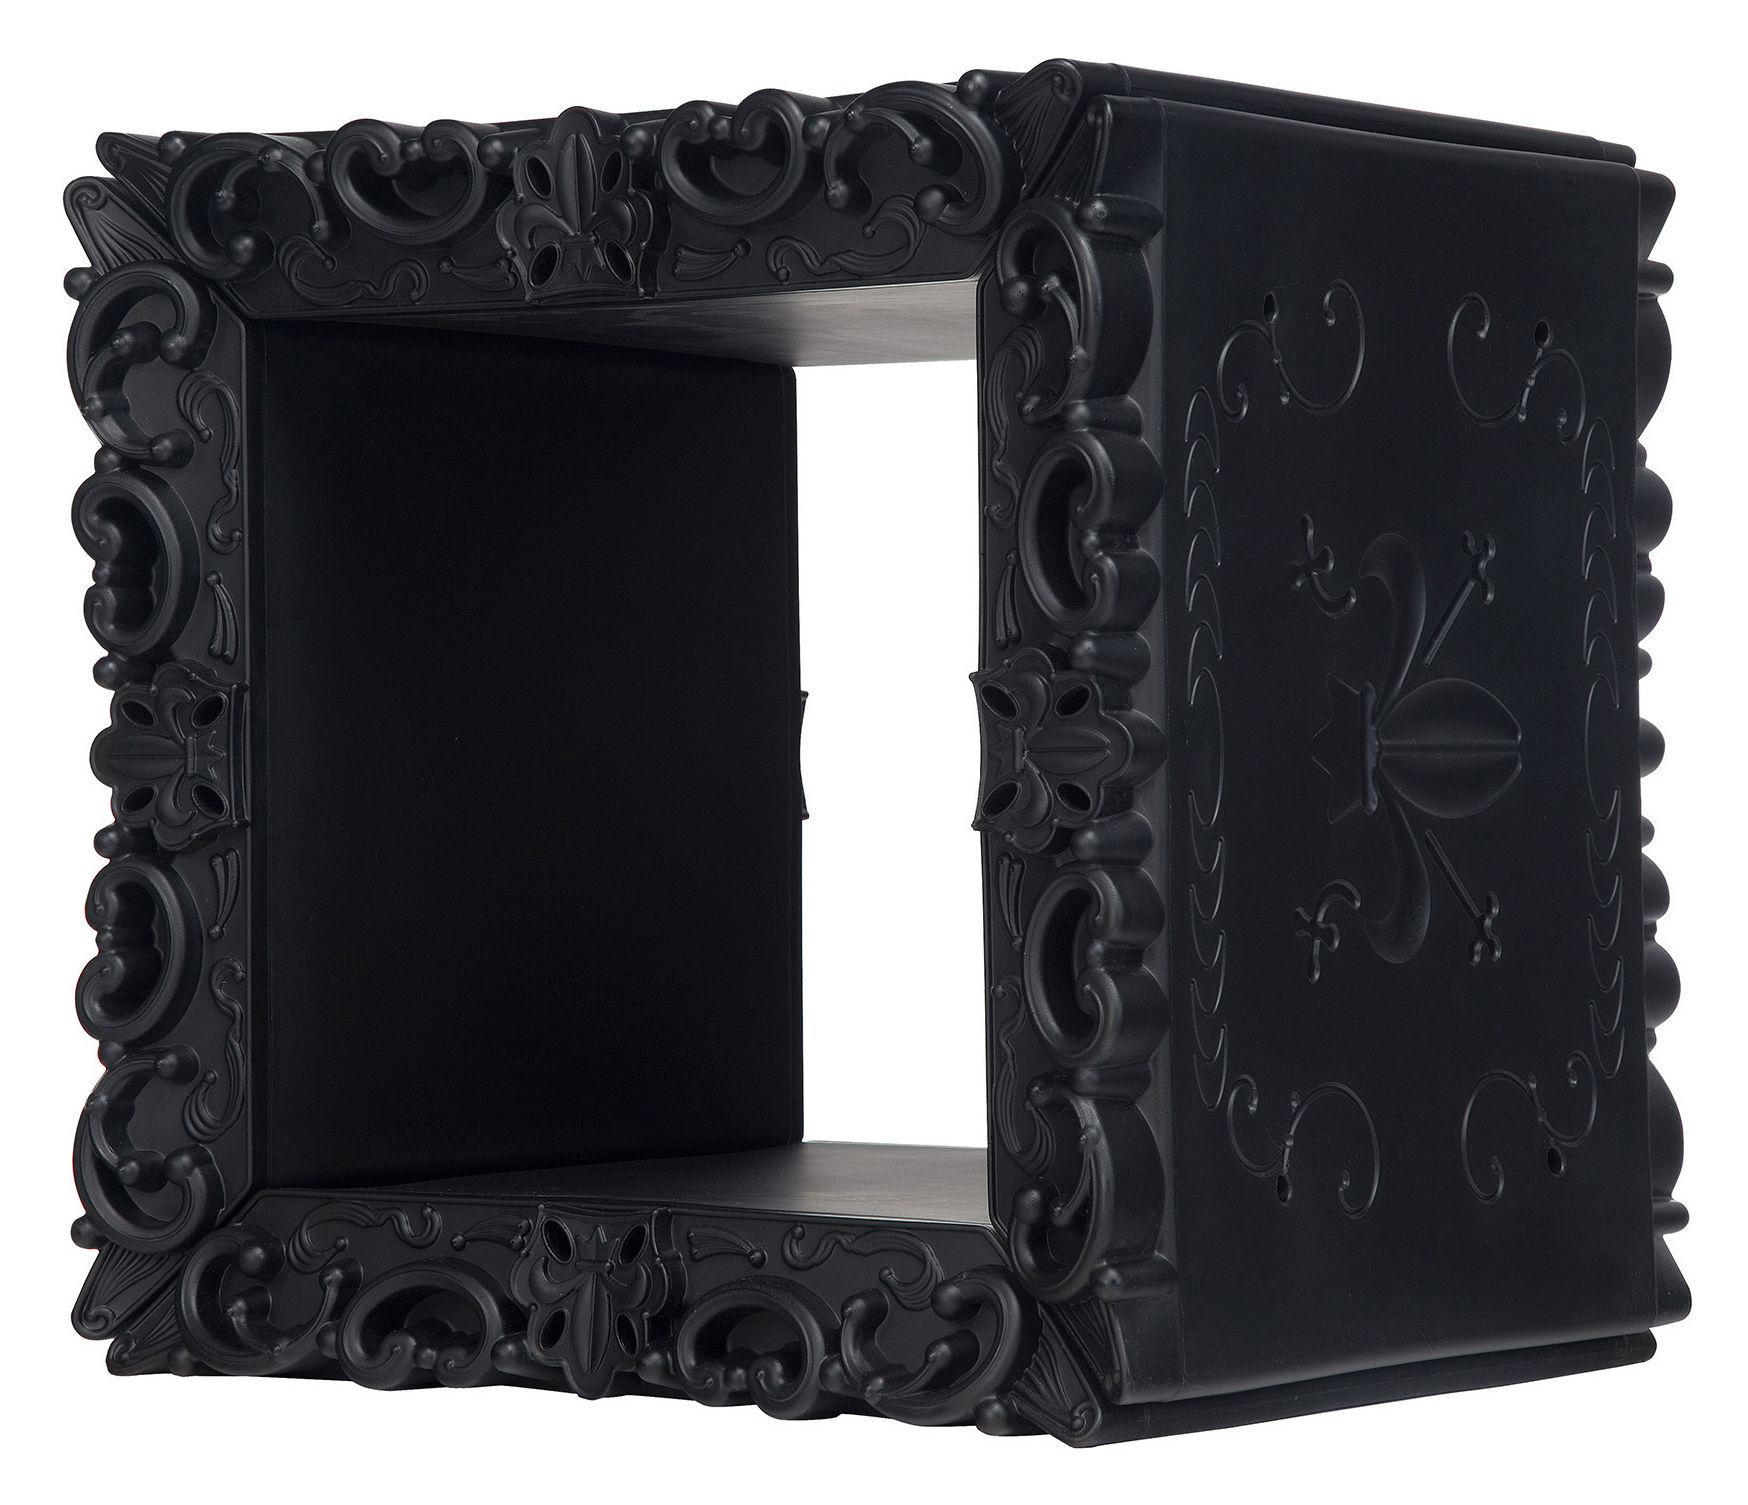 Furniture - Bookcases & Bookshelves - Jocker of Love Shelf - Modular cube - 52 x 46 cm by Design of Love by Slide - Black - roto-moulded polyhene